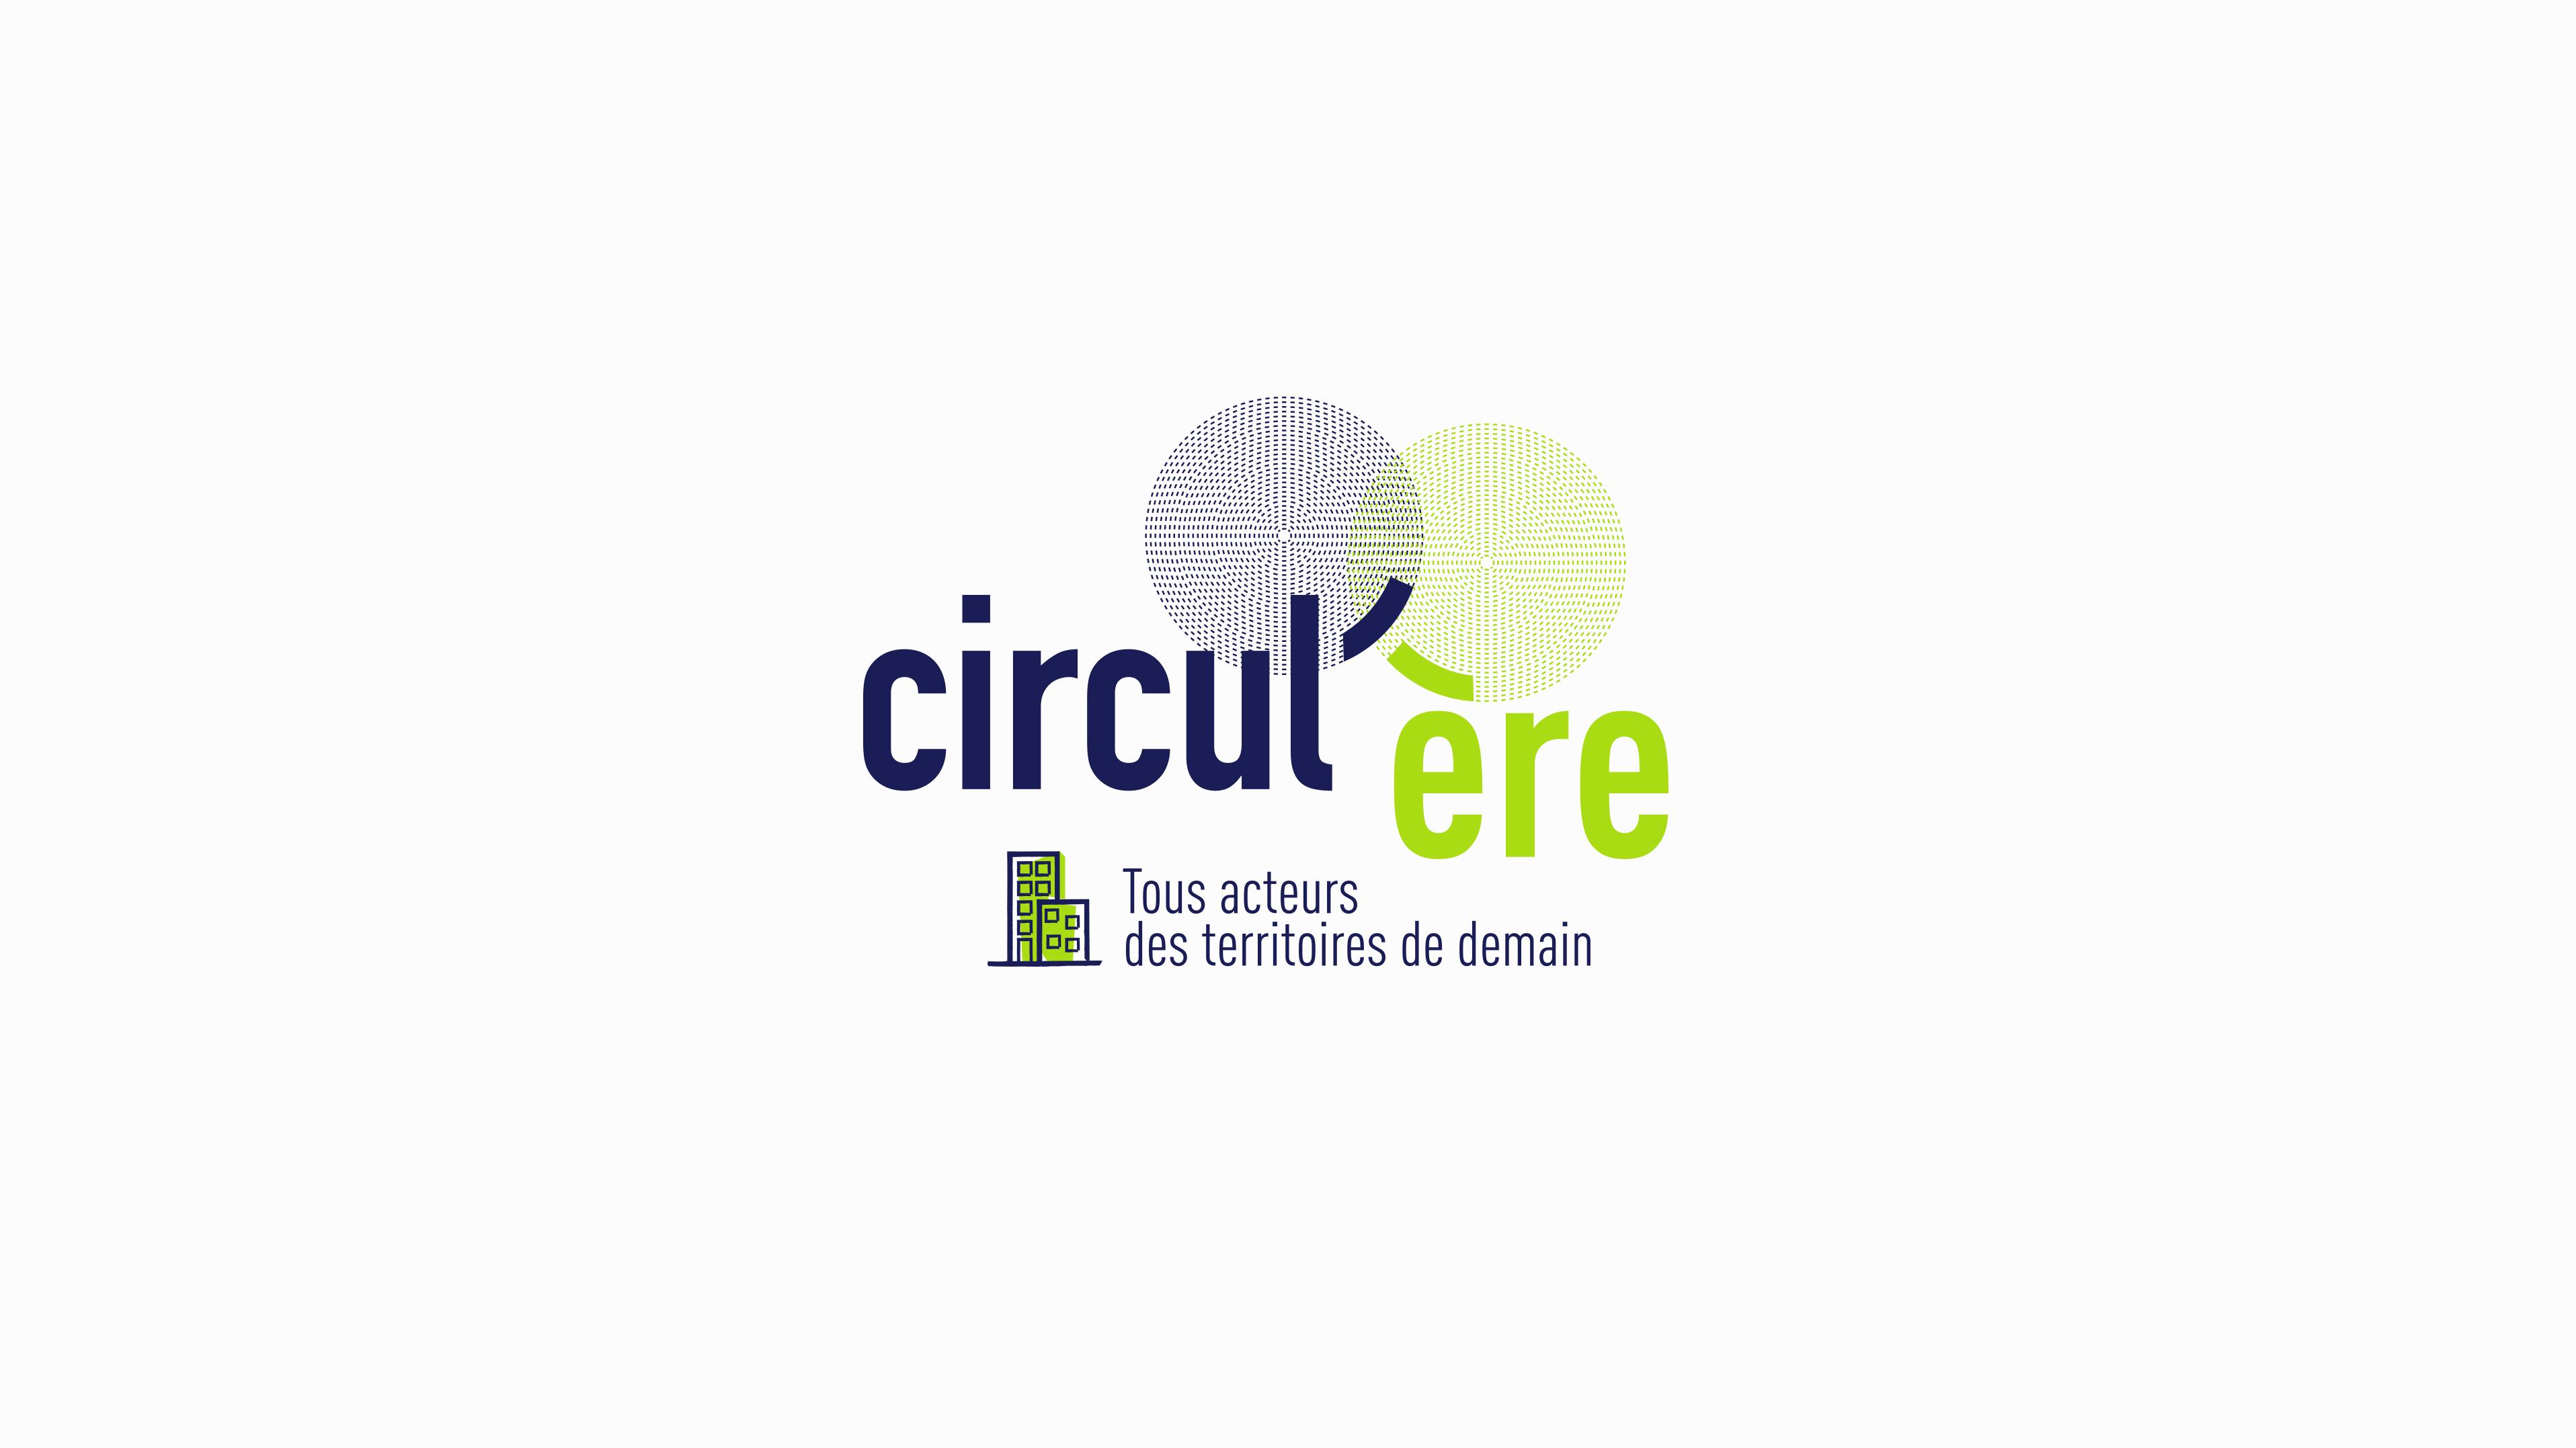 logo circul'ère copie